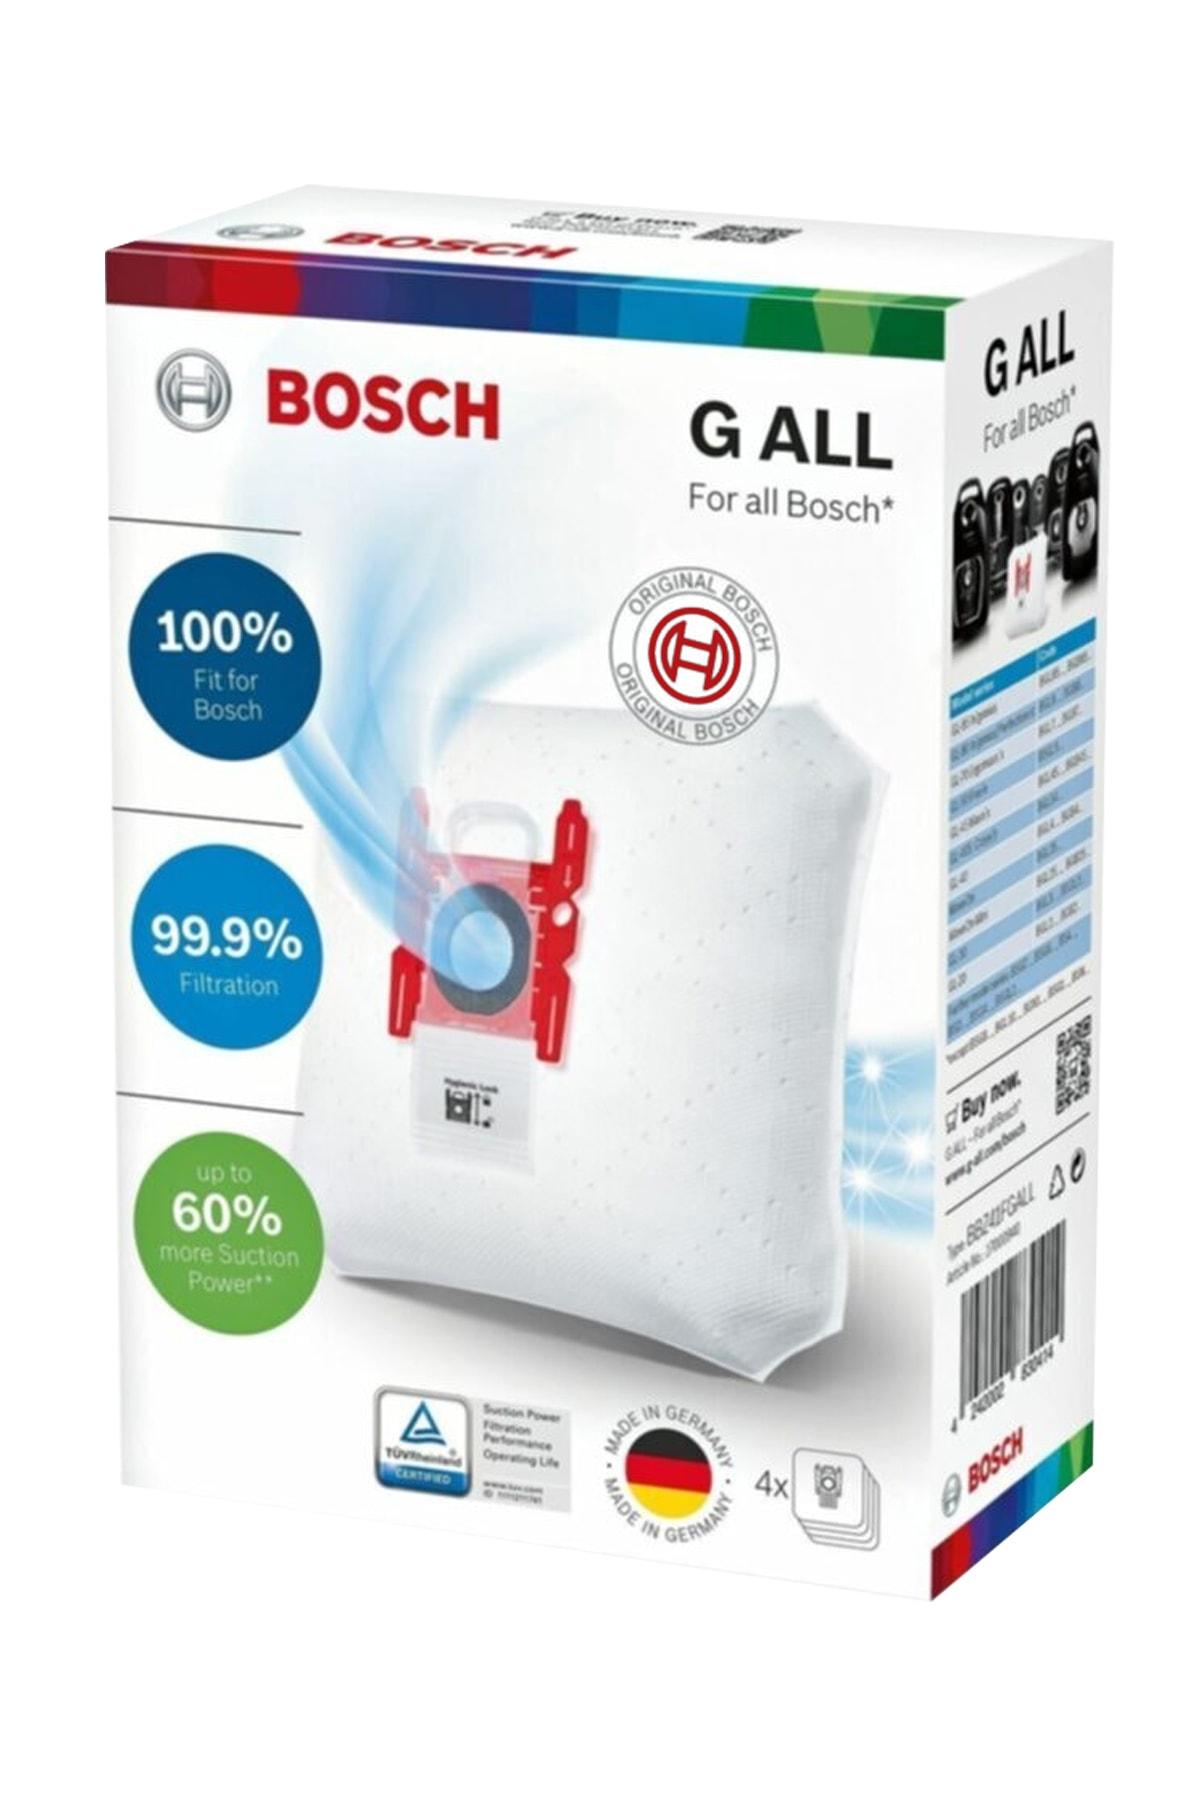 Bosch Sphera 30 G All Toz Torbası Kutulu